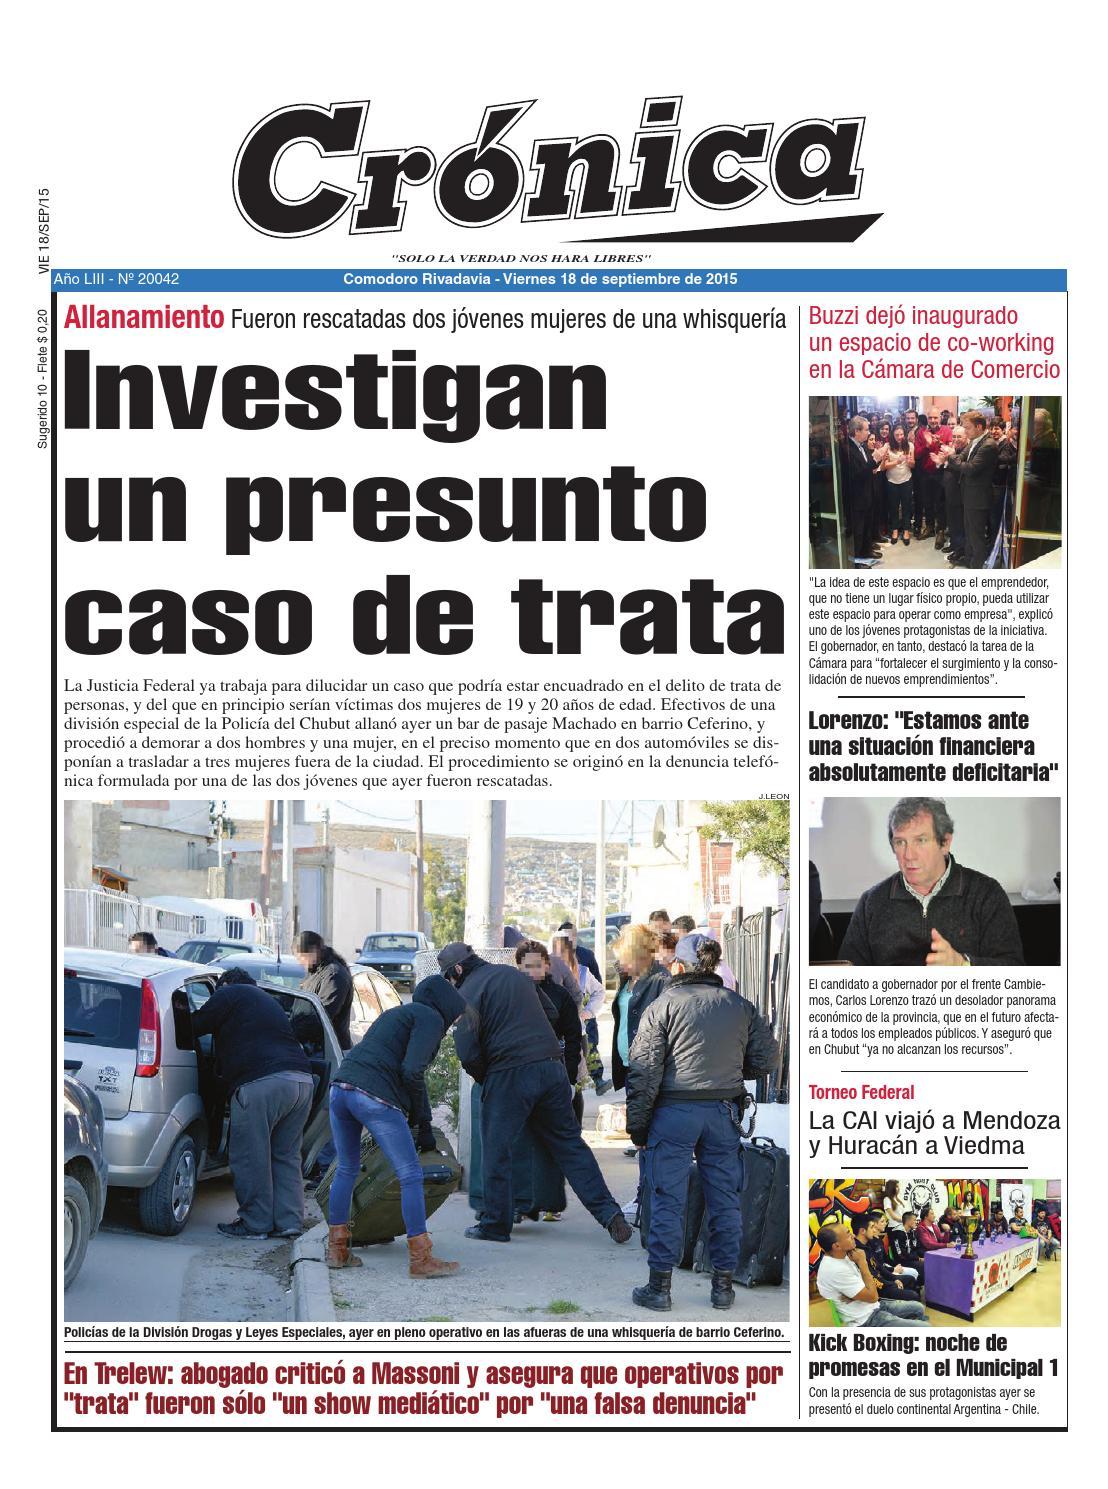 464e94f6d42 4db4b0b23e97b946a274cca1dd83042b by Diario Crónica - issuu